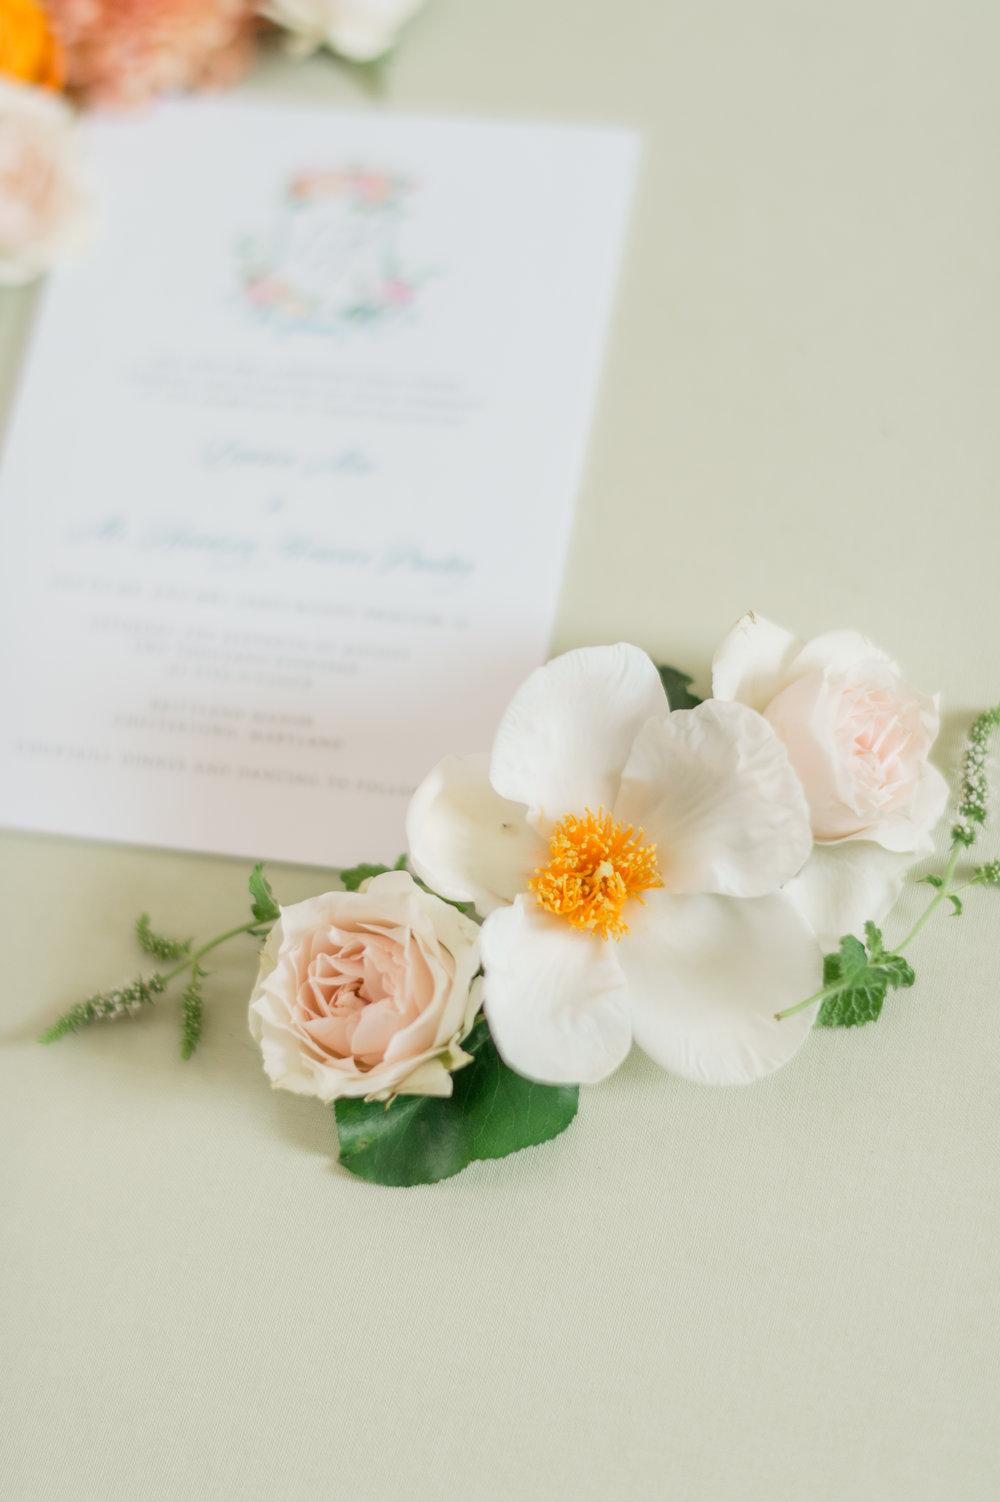 Harrison_Lauren_wedding_photo-238.jpg